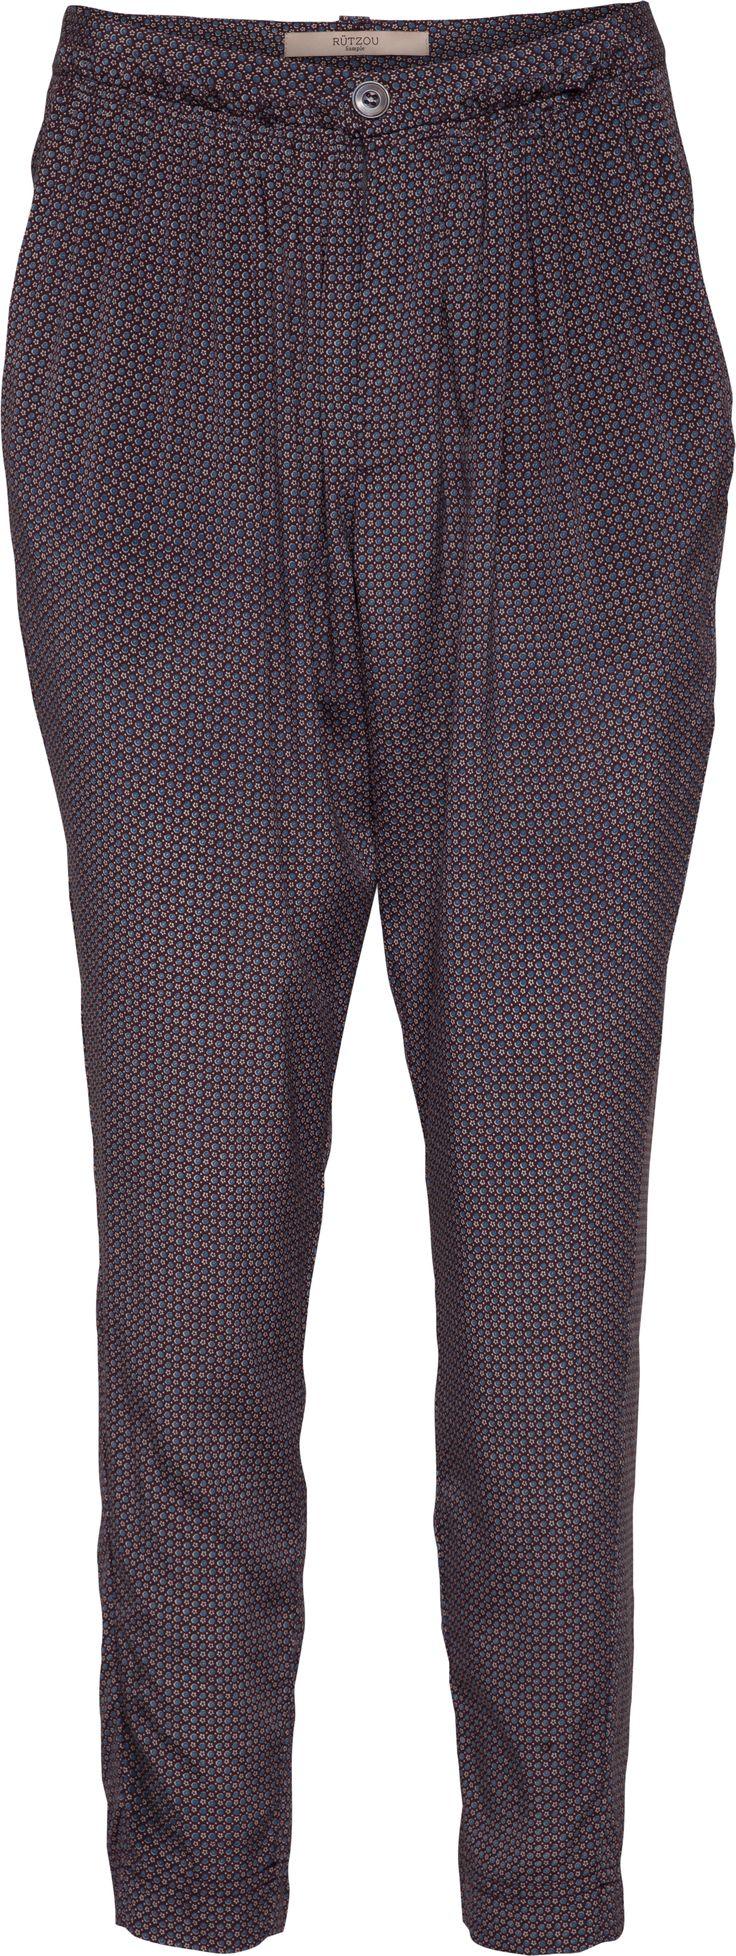 Tiny Tiles pants | AW13